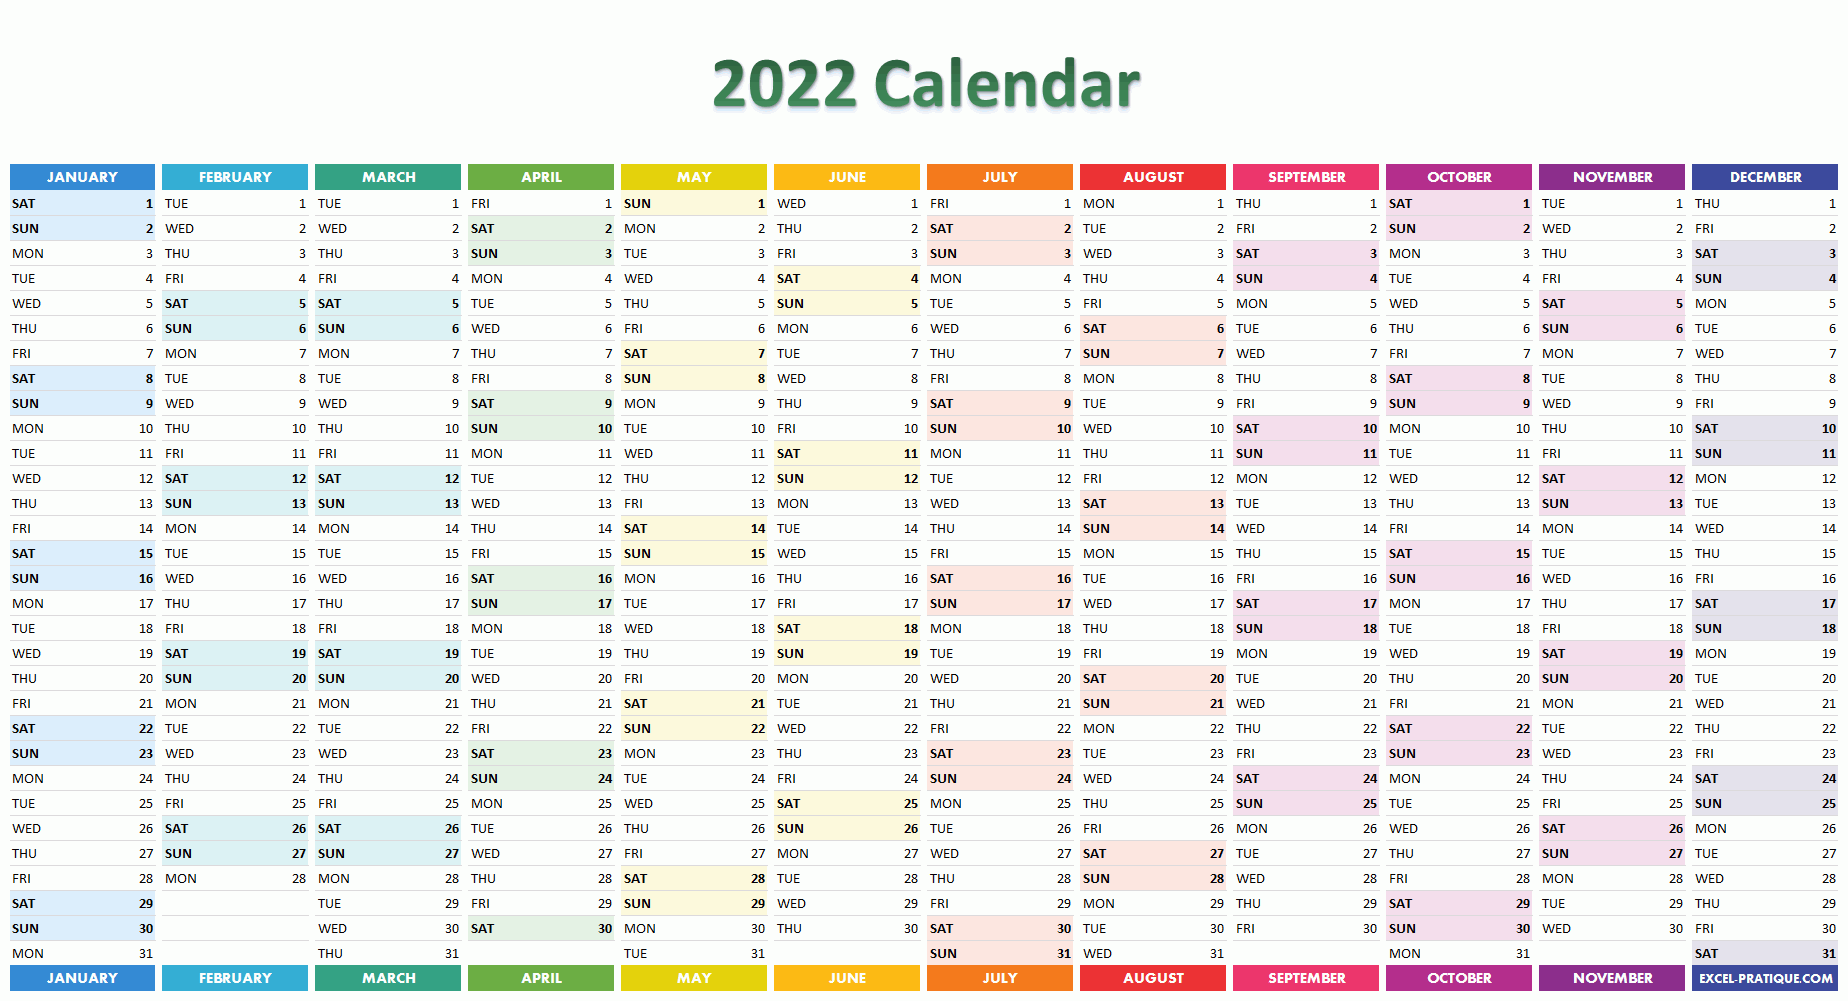 2022 Weekly Calendar Excel.2022 Calendar